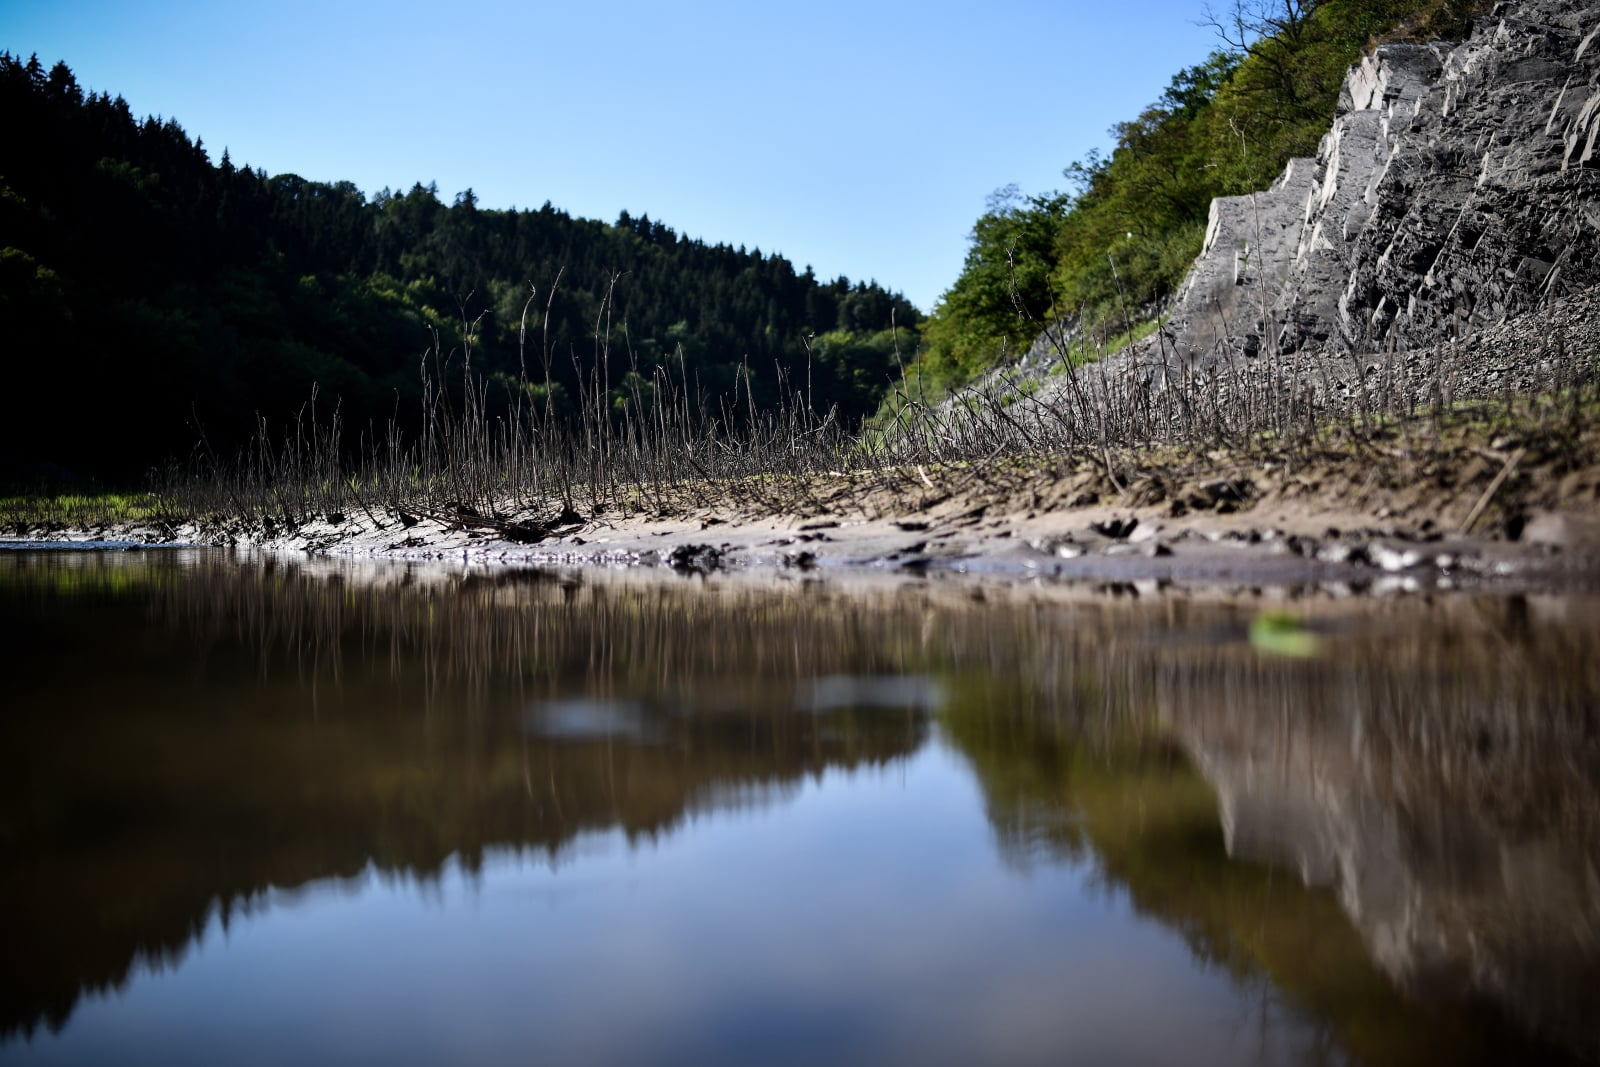 Jezioro Edersee w Niemczech, fot. EPA/SASCHA STEINBACH